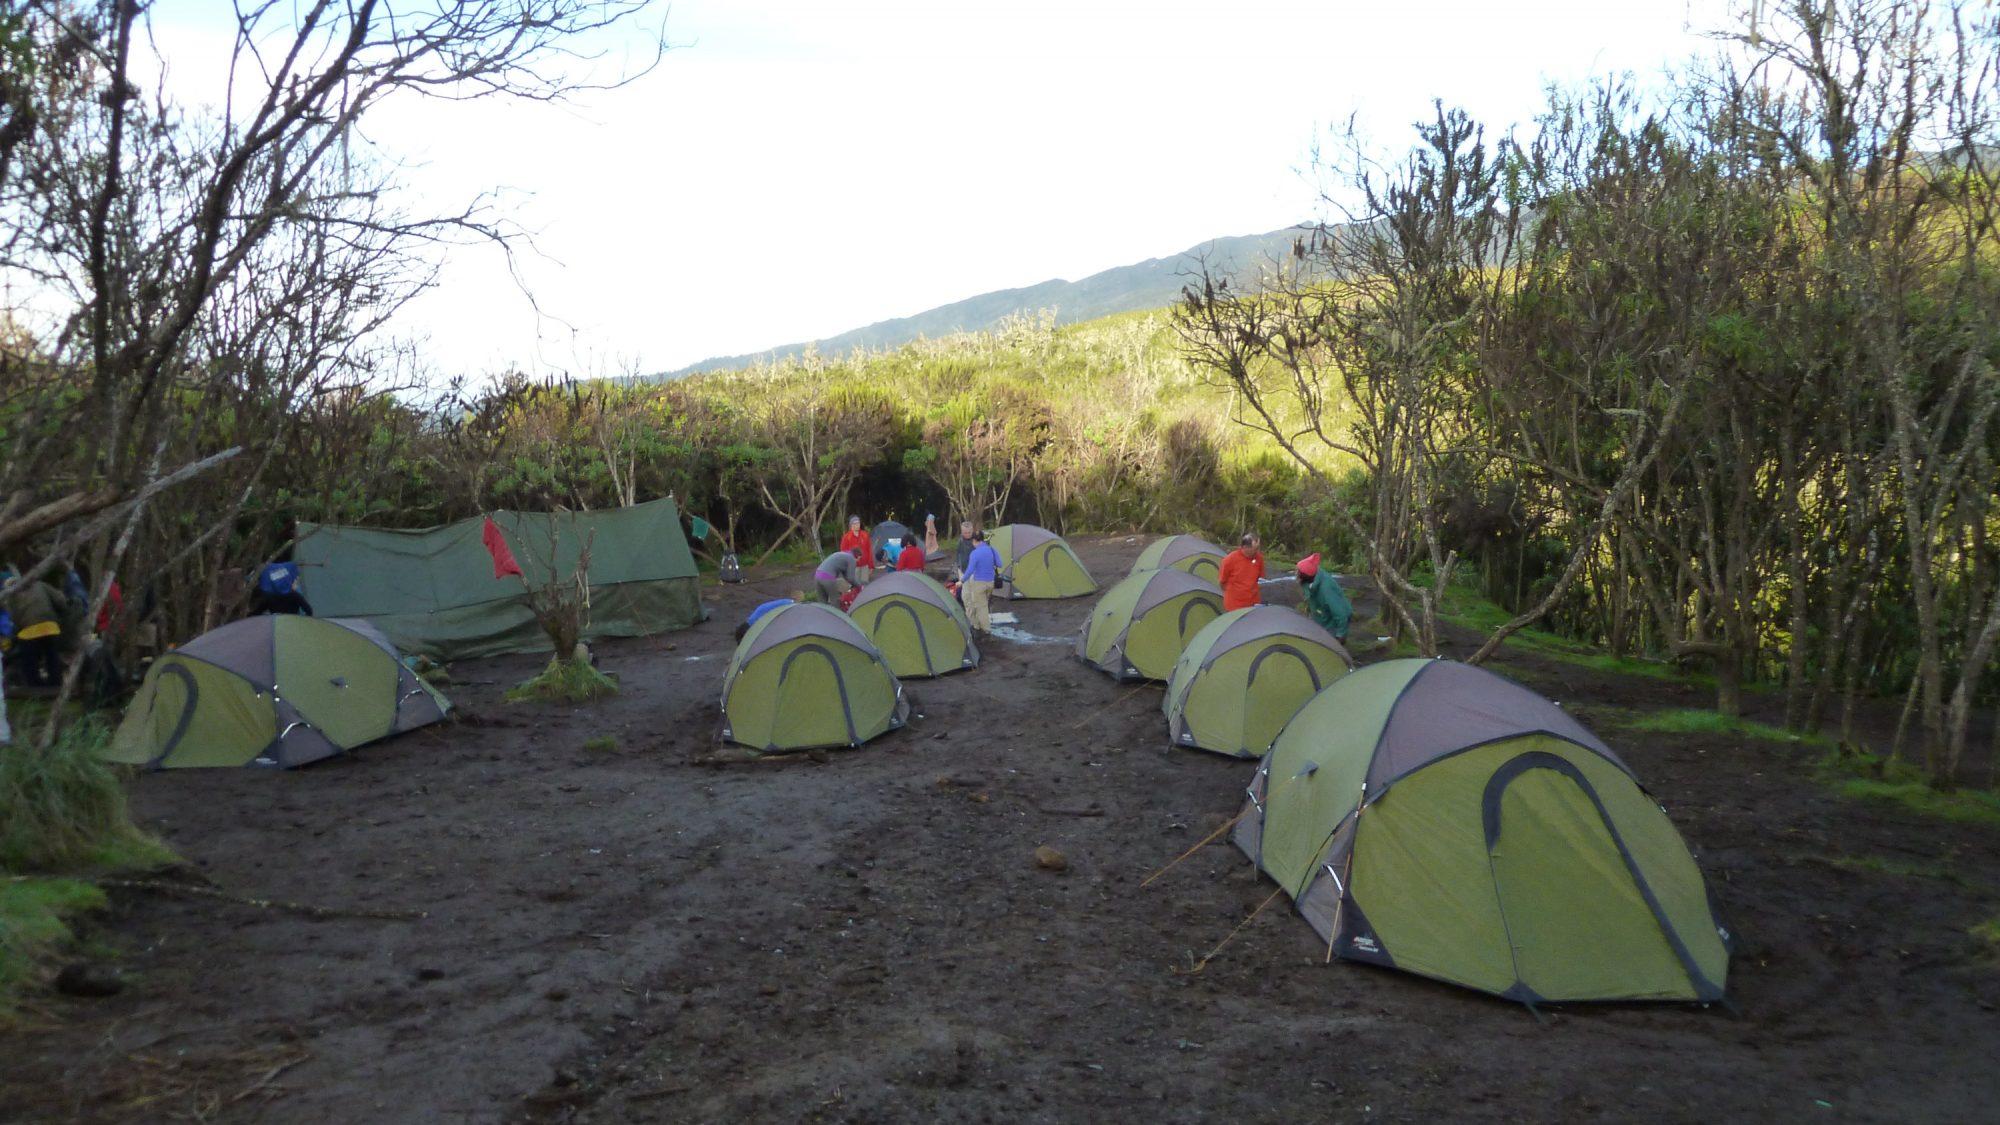 Machame Camp, Zeltlager, Kilimandscharo, Kilimandscharo besteigen, Tansania, Afrika, Kilimandscharo Tour, Erfahrungsbericht, Machame Route